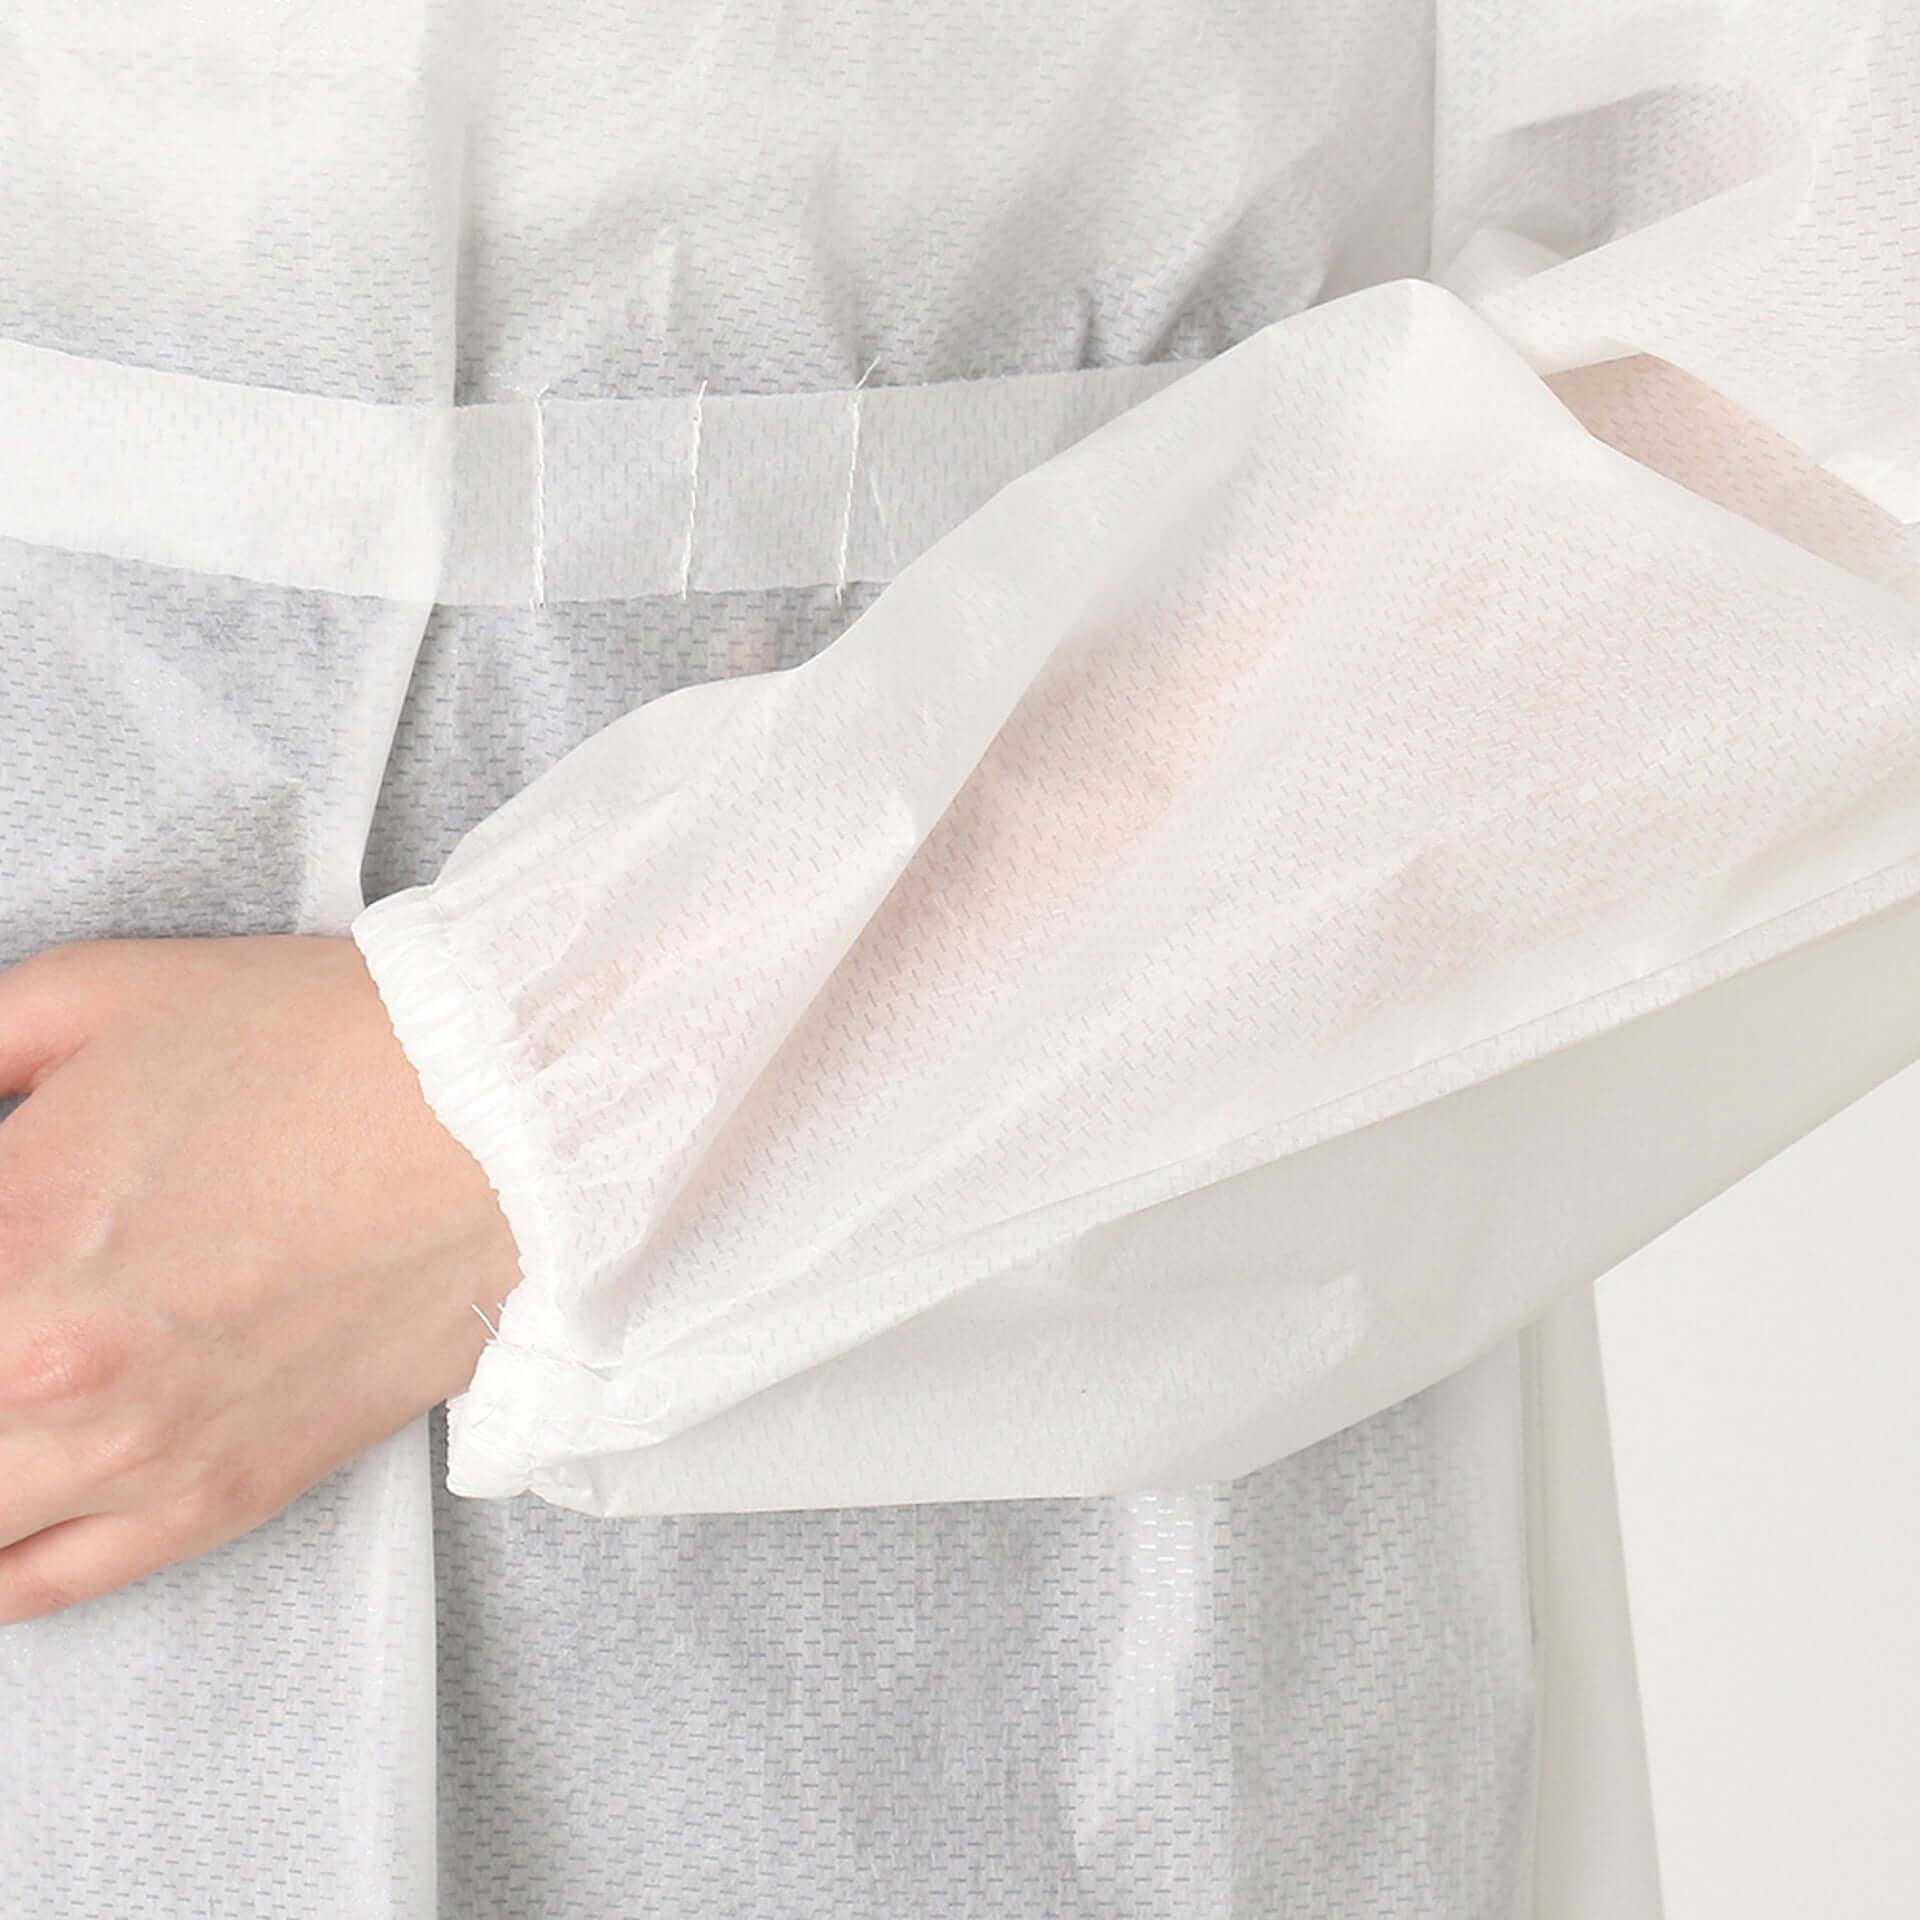 EDWINがアイソレーションガウンを自社縫製工場にて生産開始&オンライン販売もスタート! lf200722_edwin_6-1920x1920